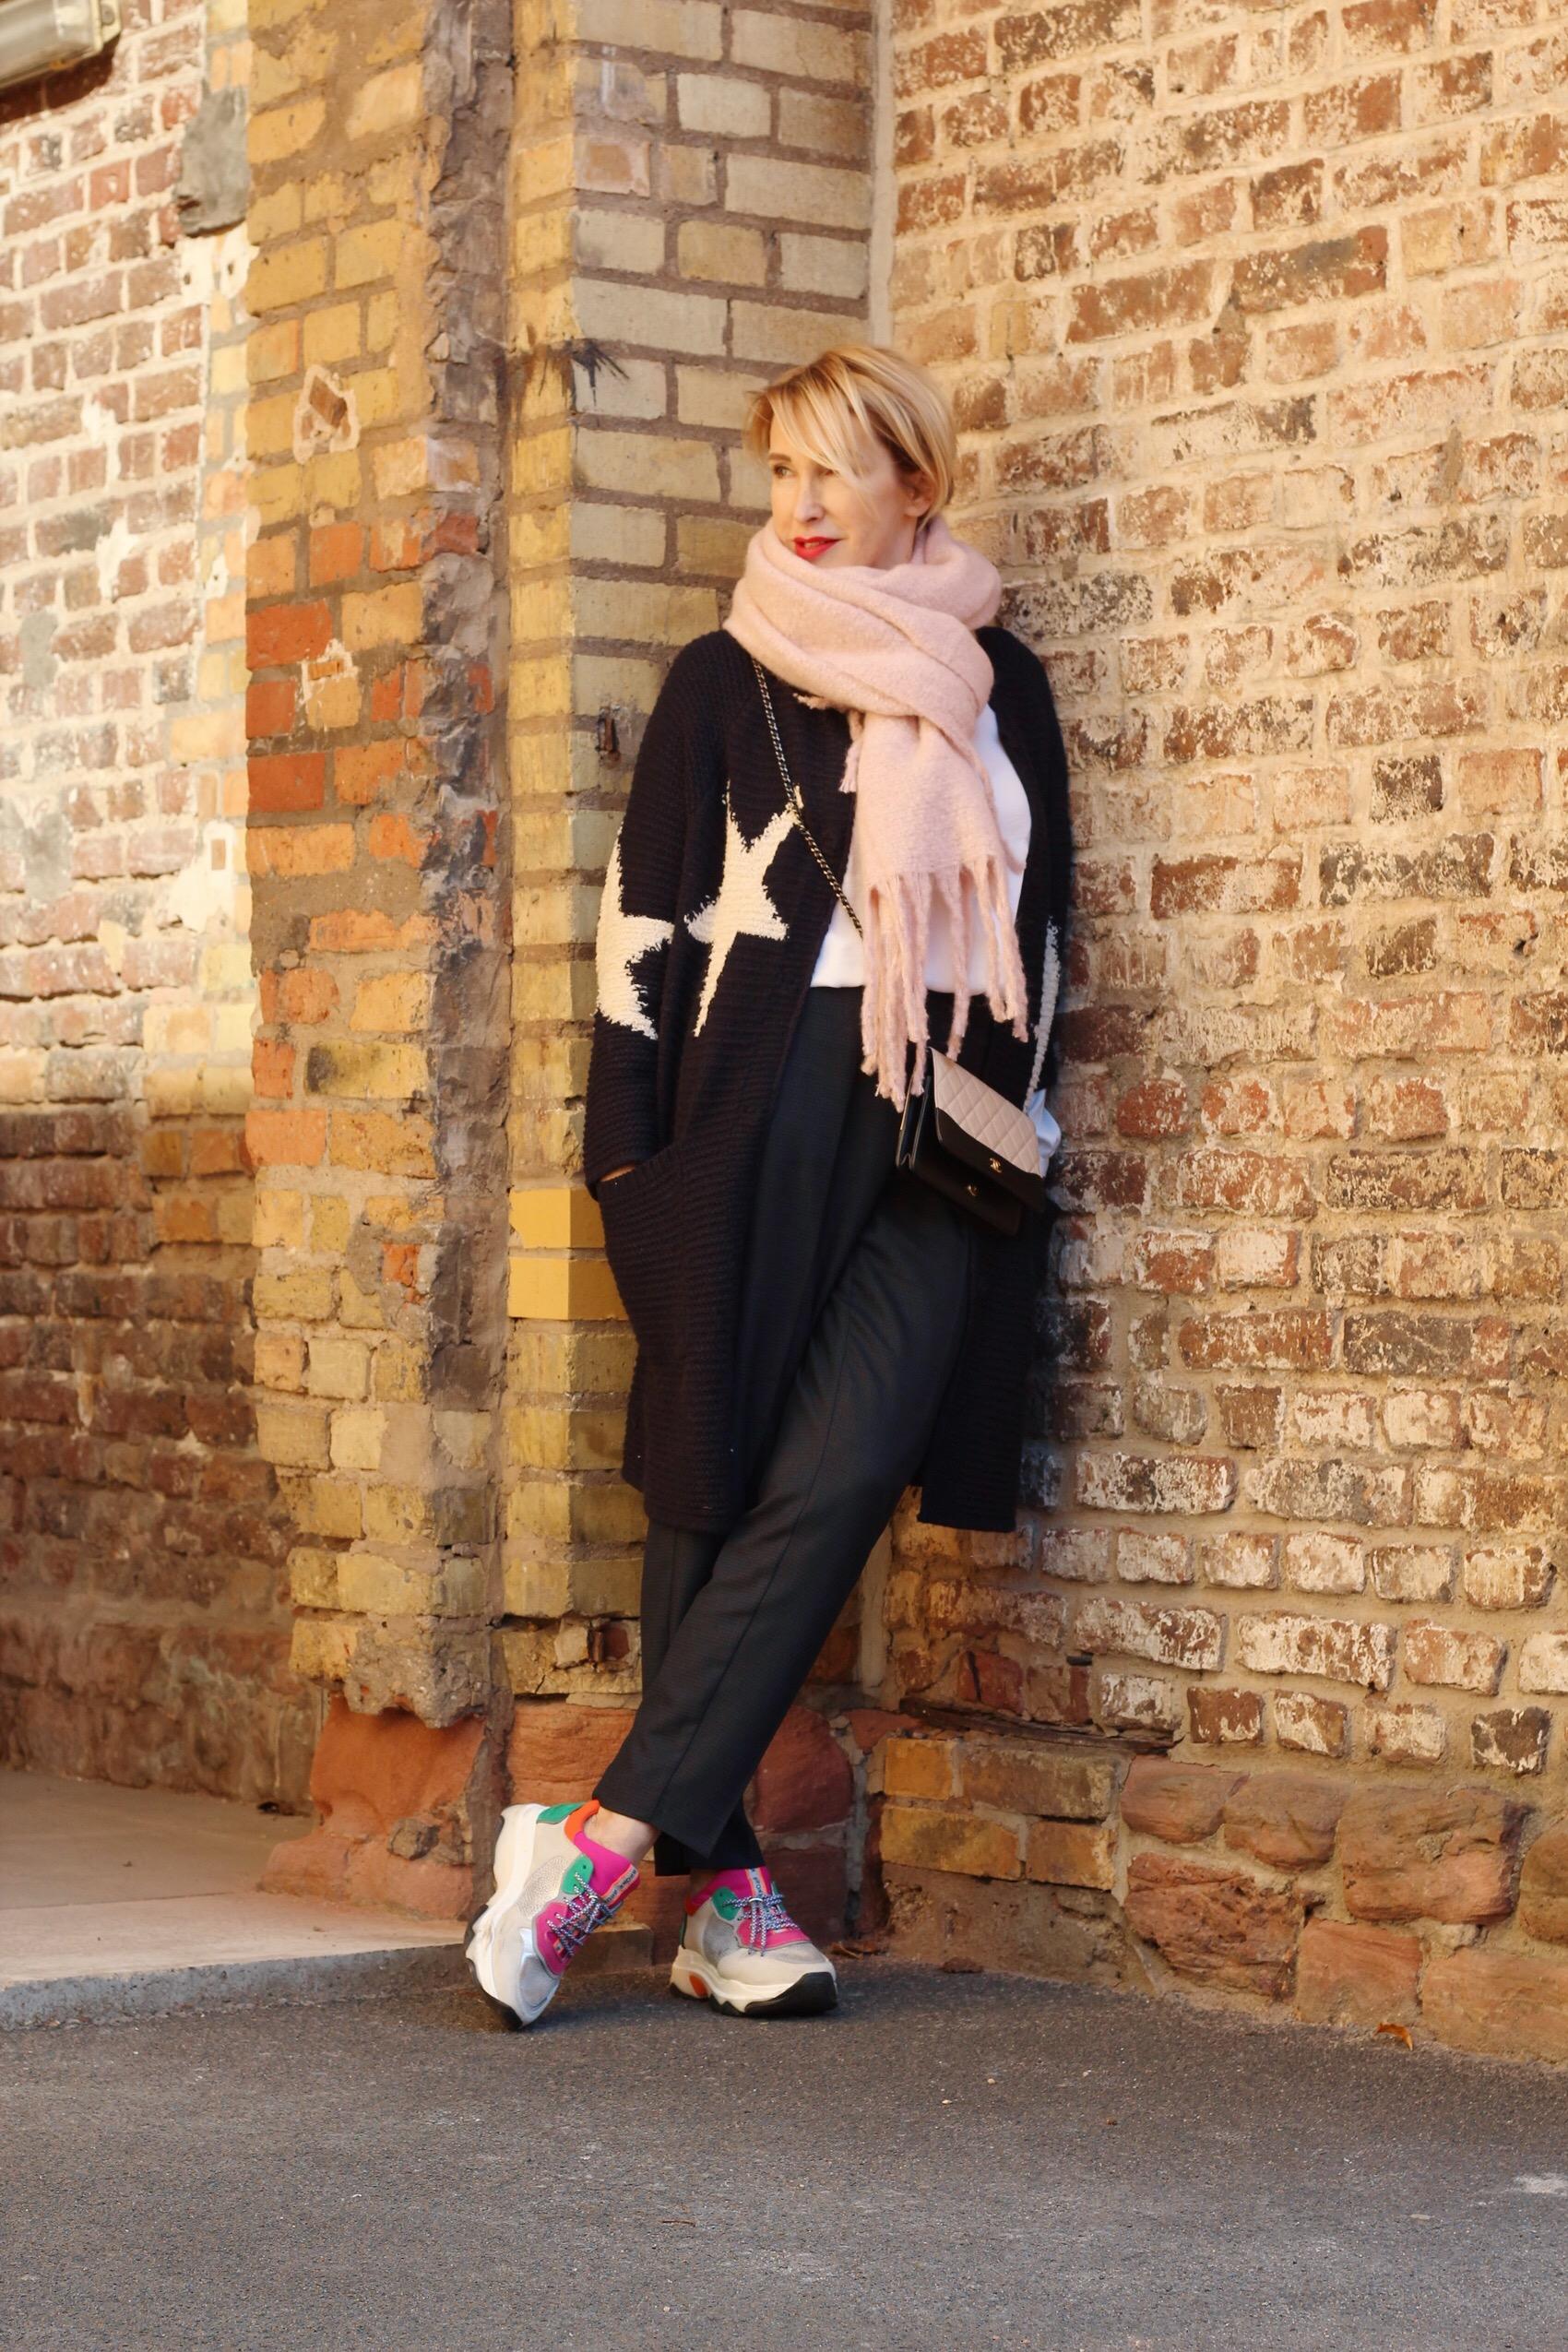 glamupyourlifestyle Bonita-Winterkollektion Cardigan lange-Strickjacke Franziska-knuppe ü-40-blog ue-50-blog